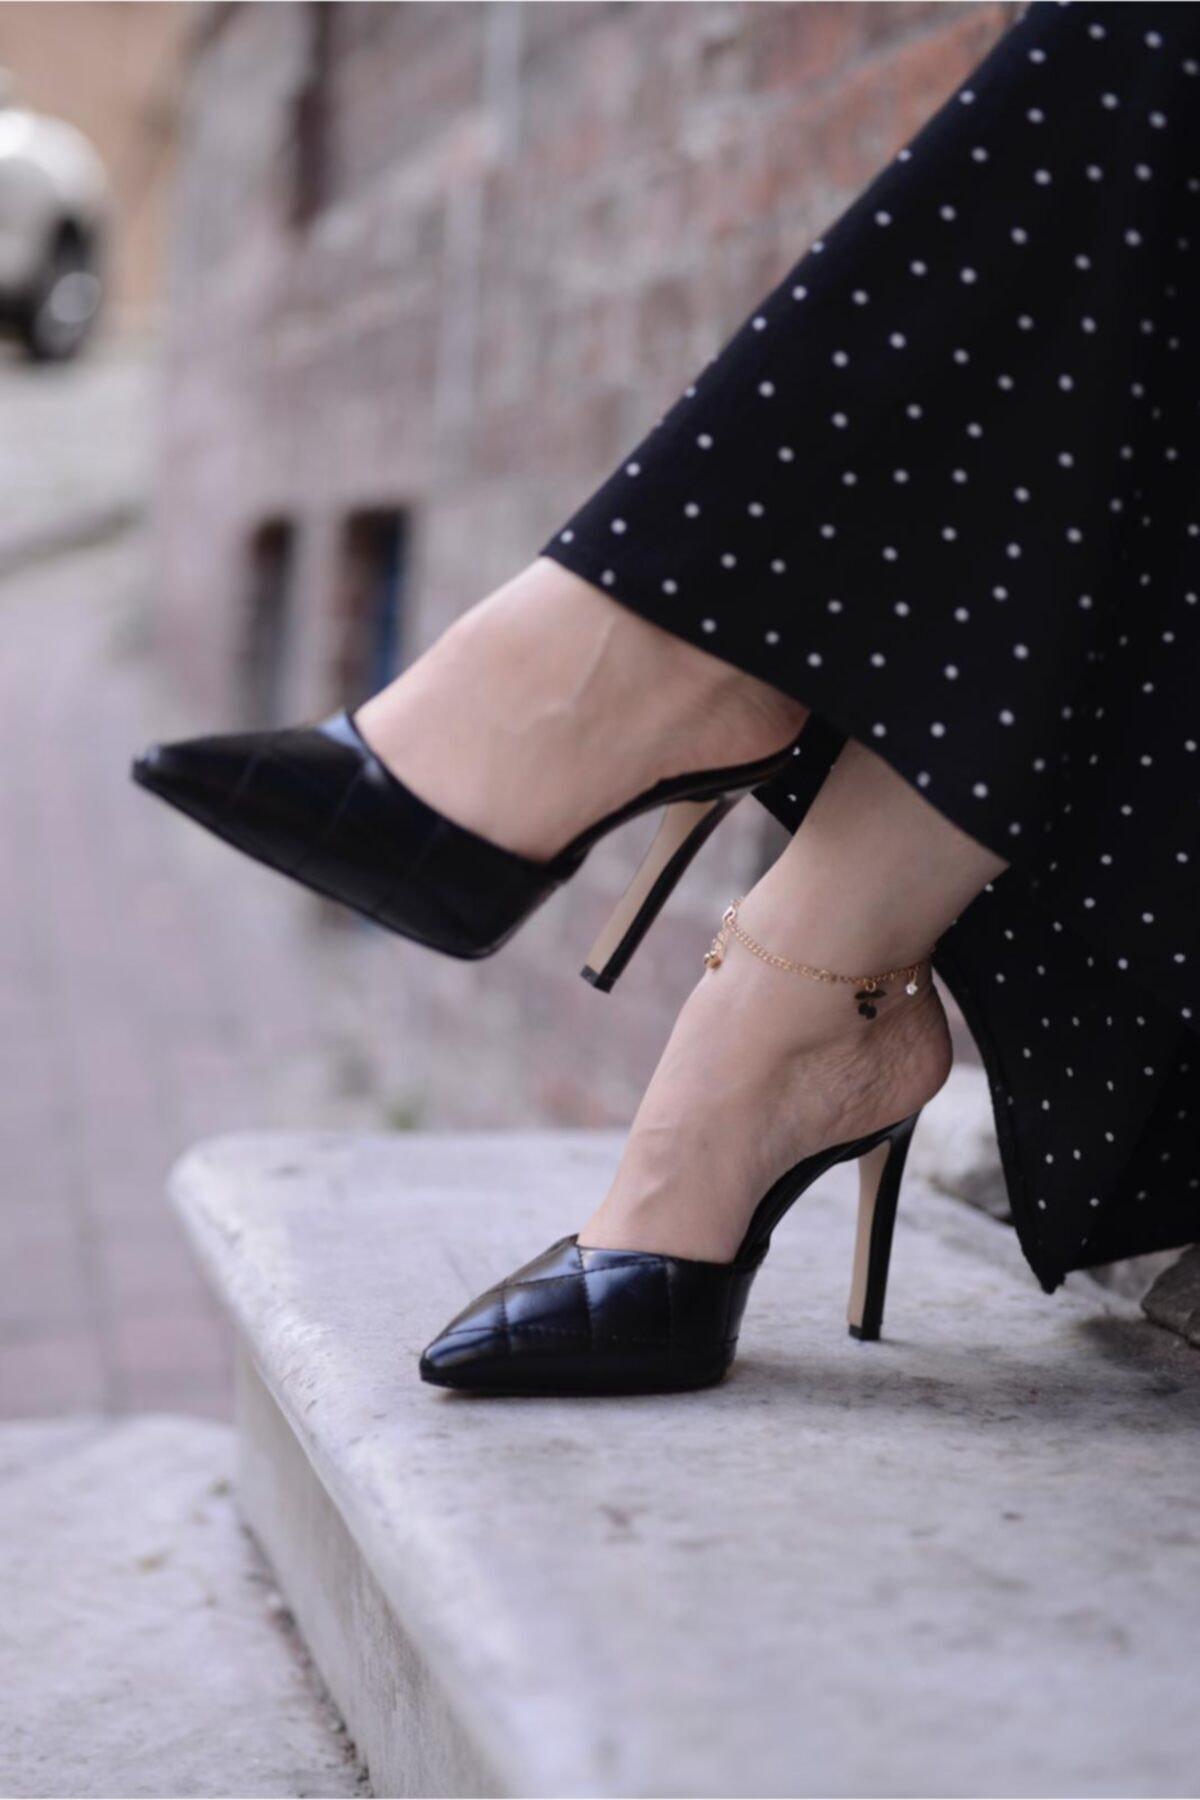 Malina Ayakkabı Çanta Kadın Siyah Sivri Kapalı Burun Topuklu Terlik 1